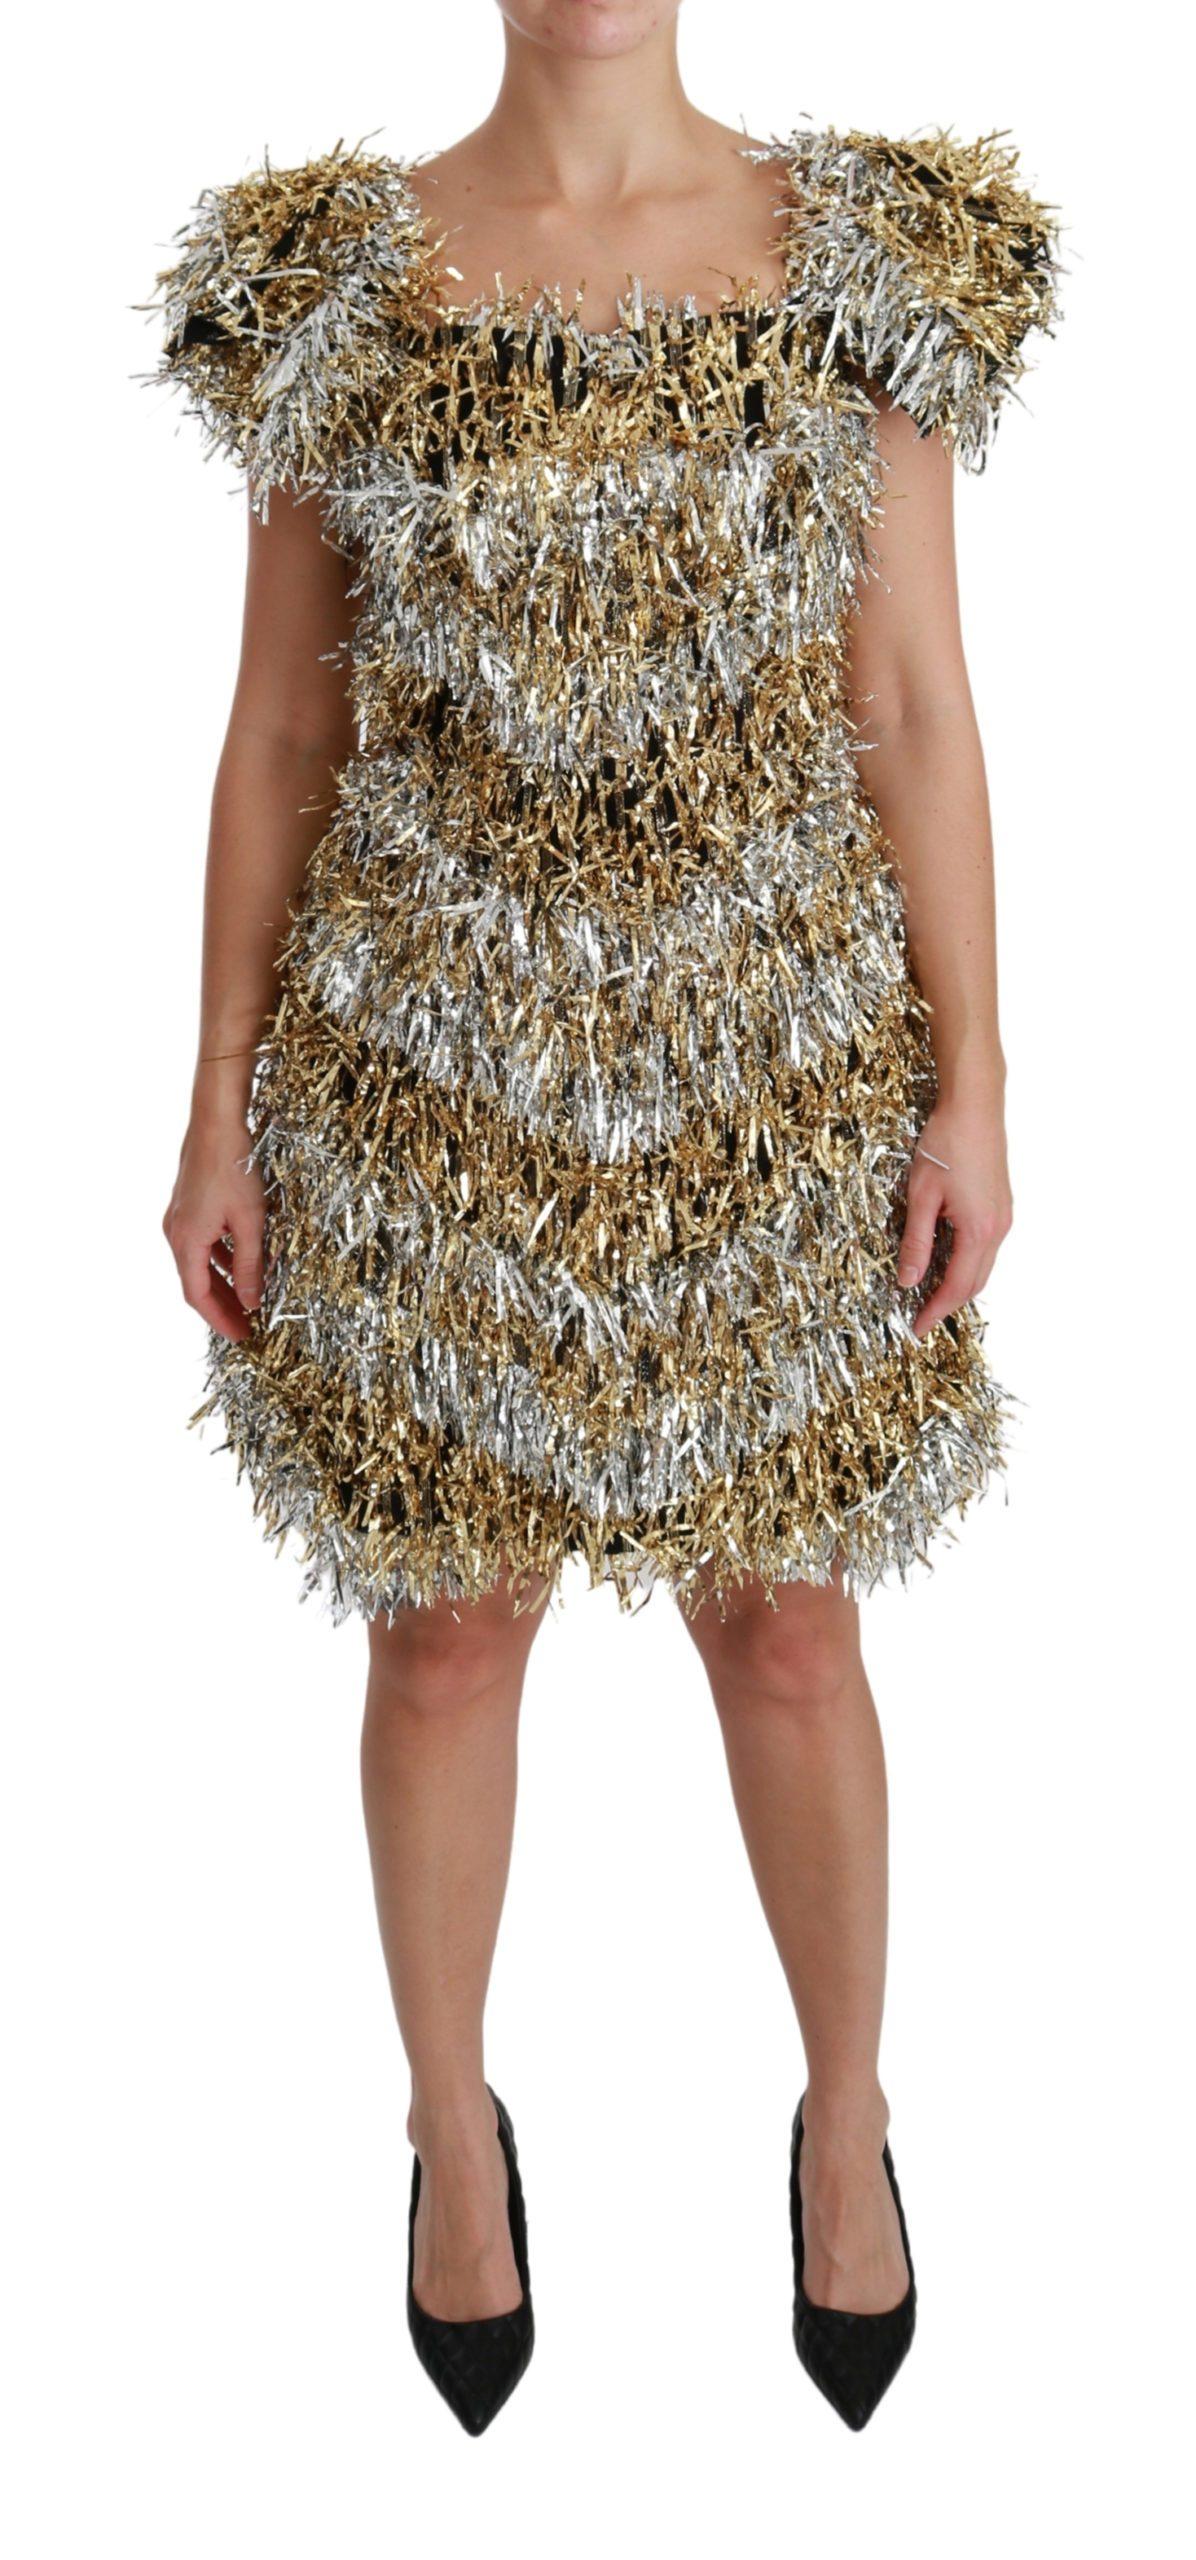 Dolce & Gabbana Women's Sheath Mini Shift Gown Dress Silver DR2510 - IT40 S